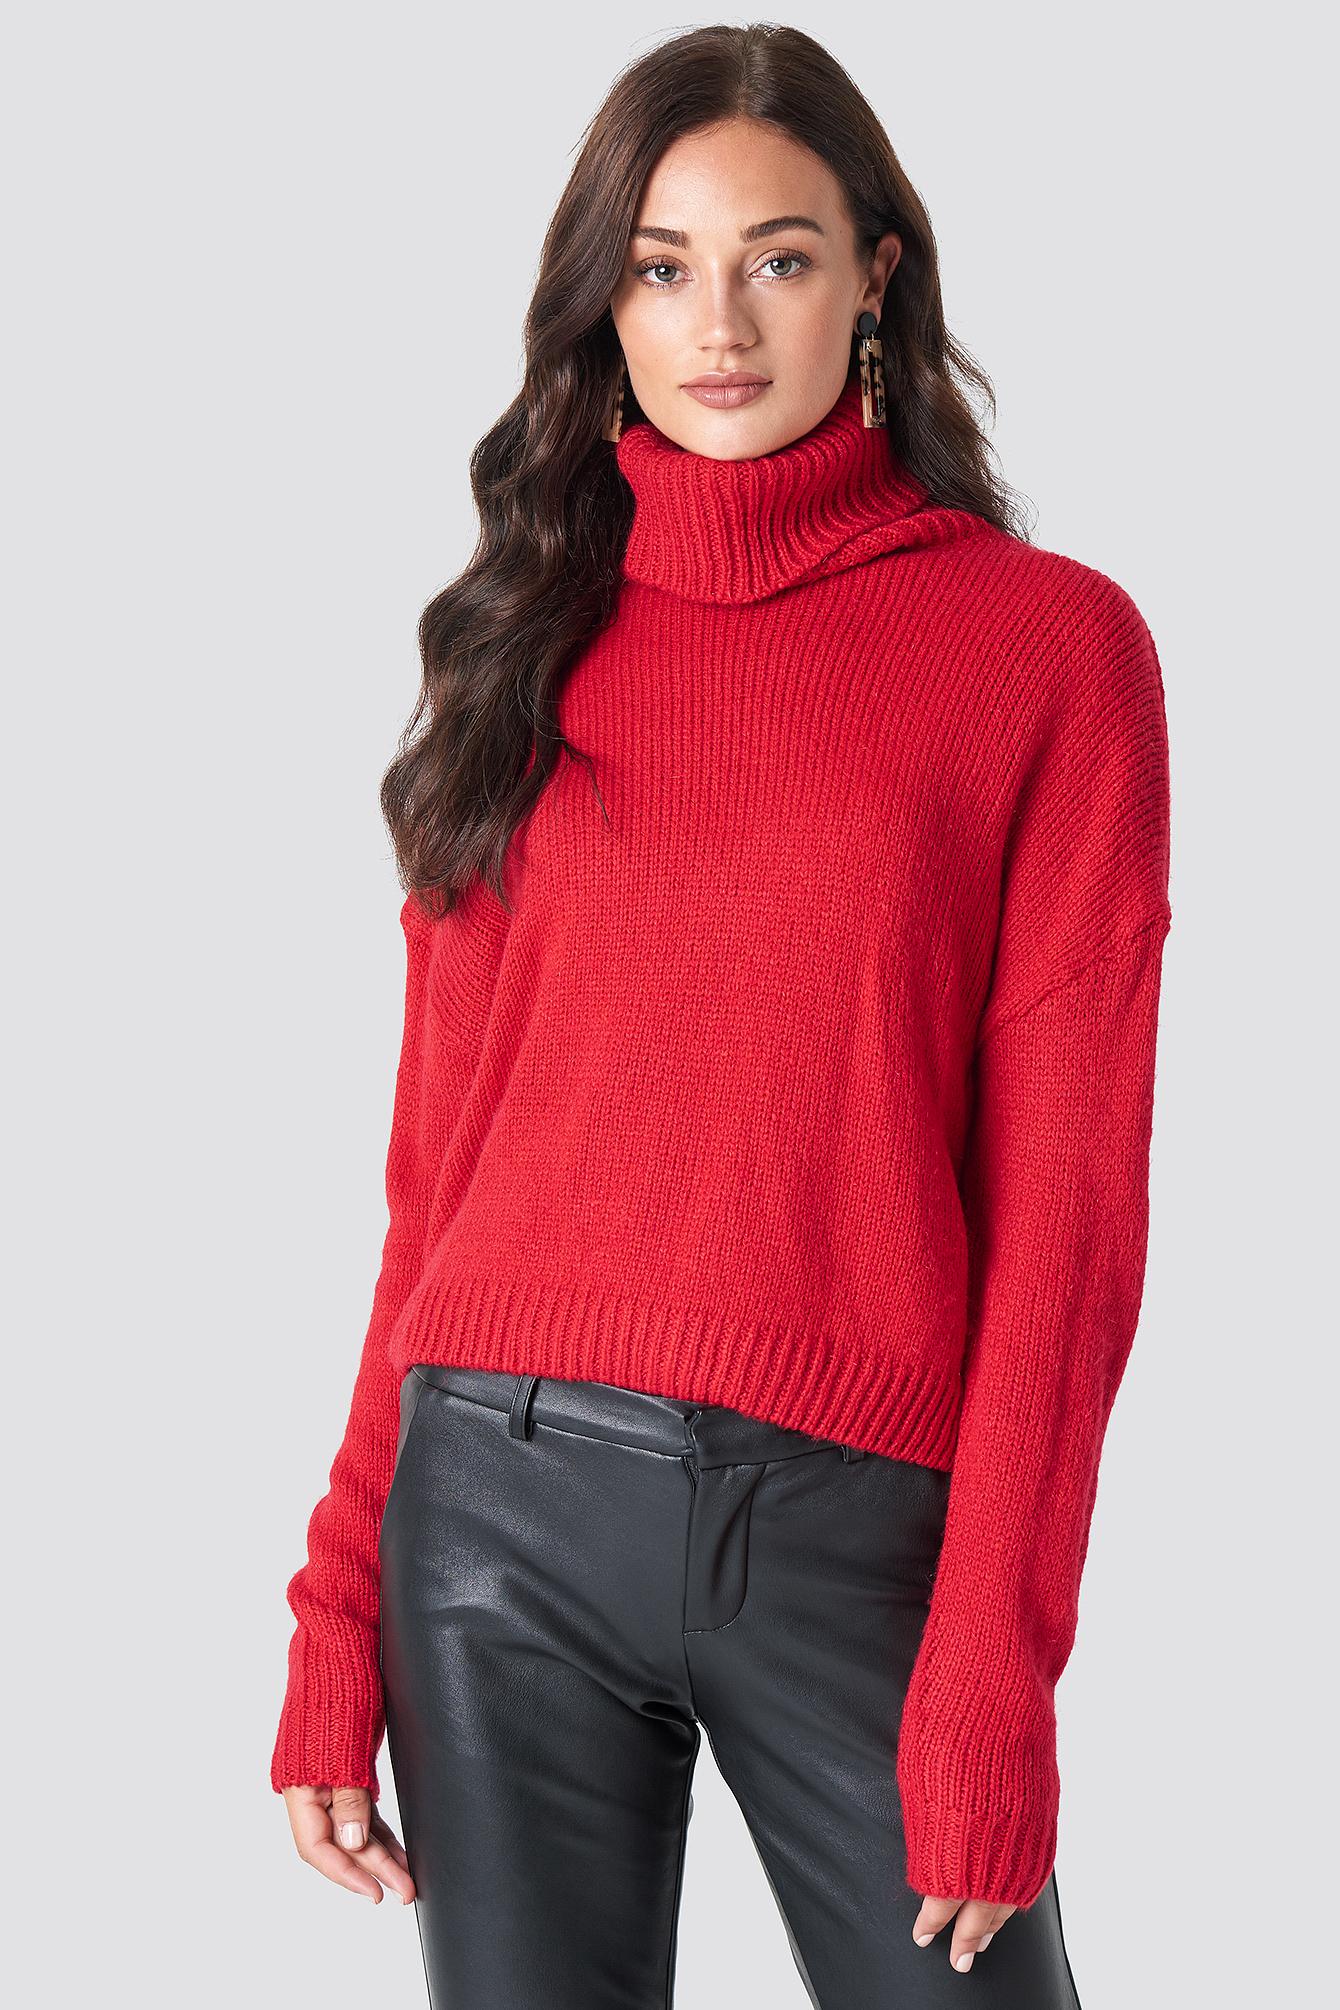 Folded Oversize Short Knitted Sweater NA-KD.COM